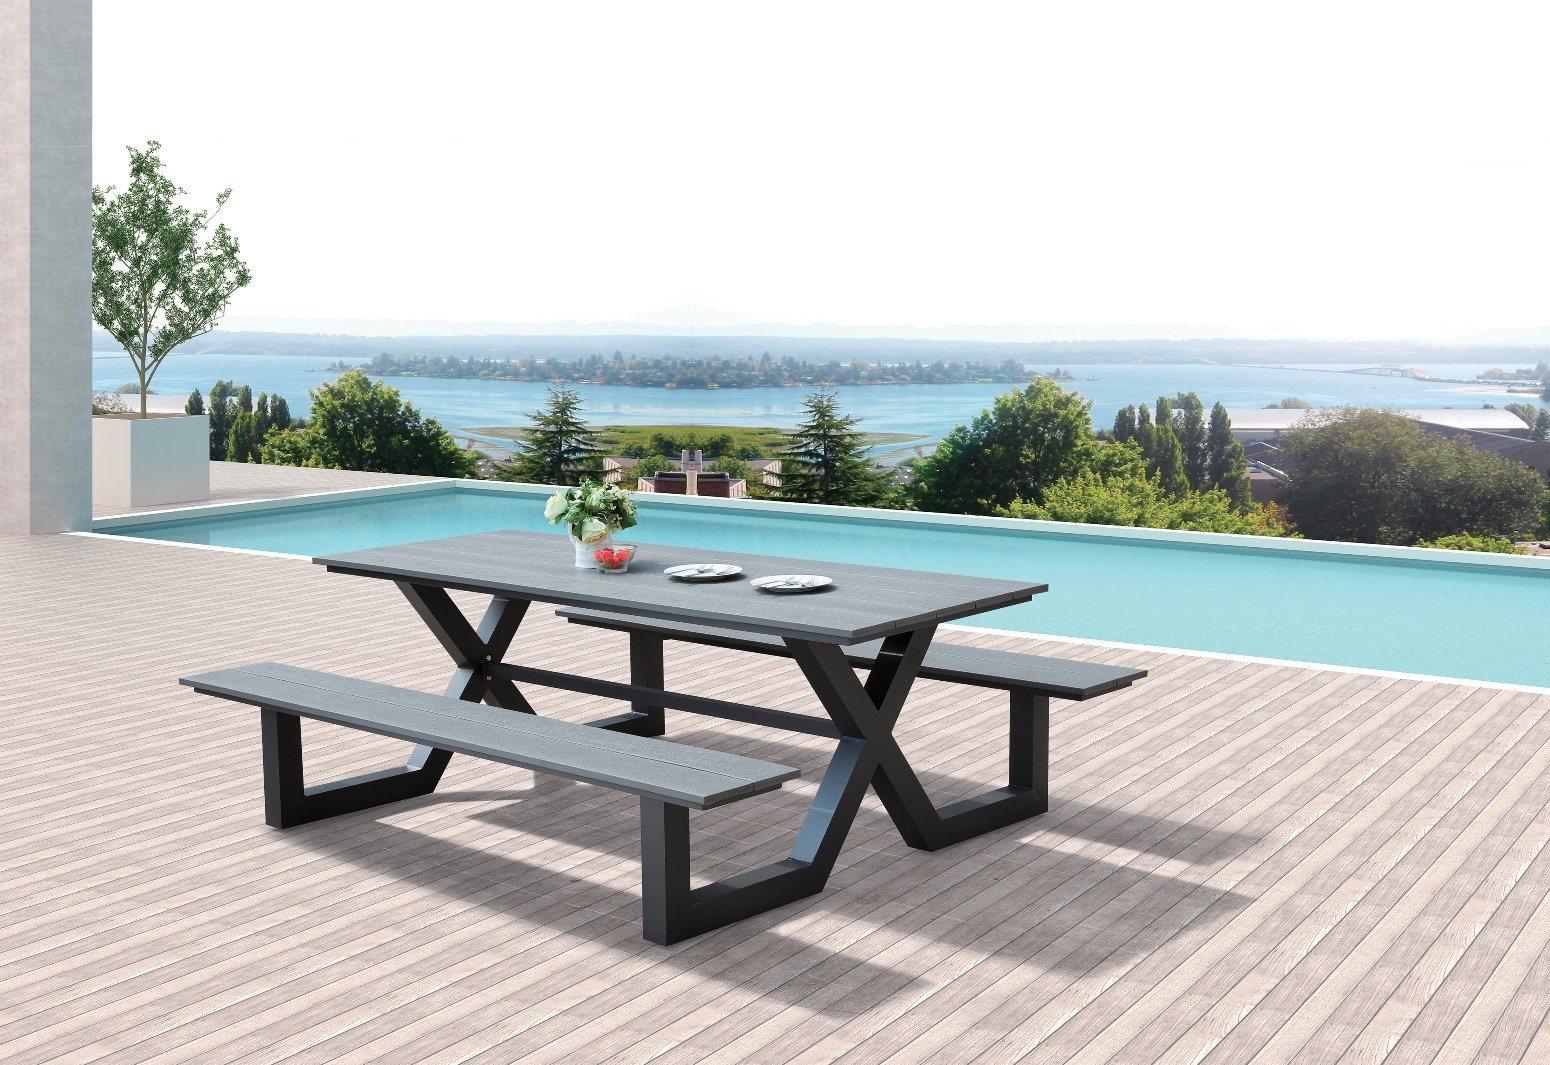 Outdoor Patio Home Hotel Office Luxury Arch Bench Garden Chair (J655)